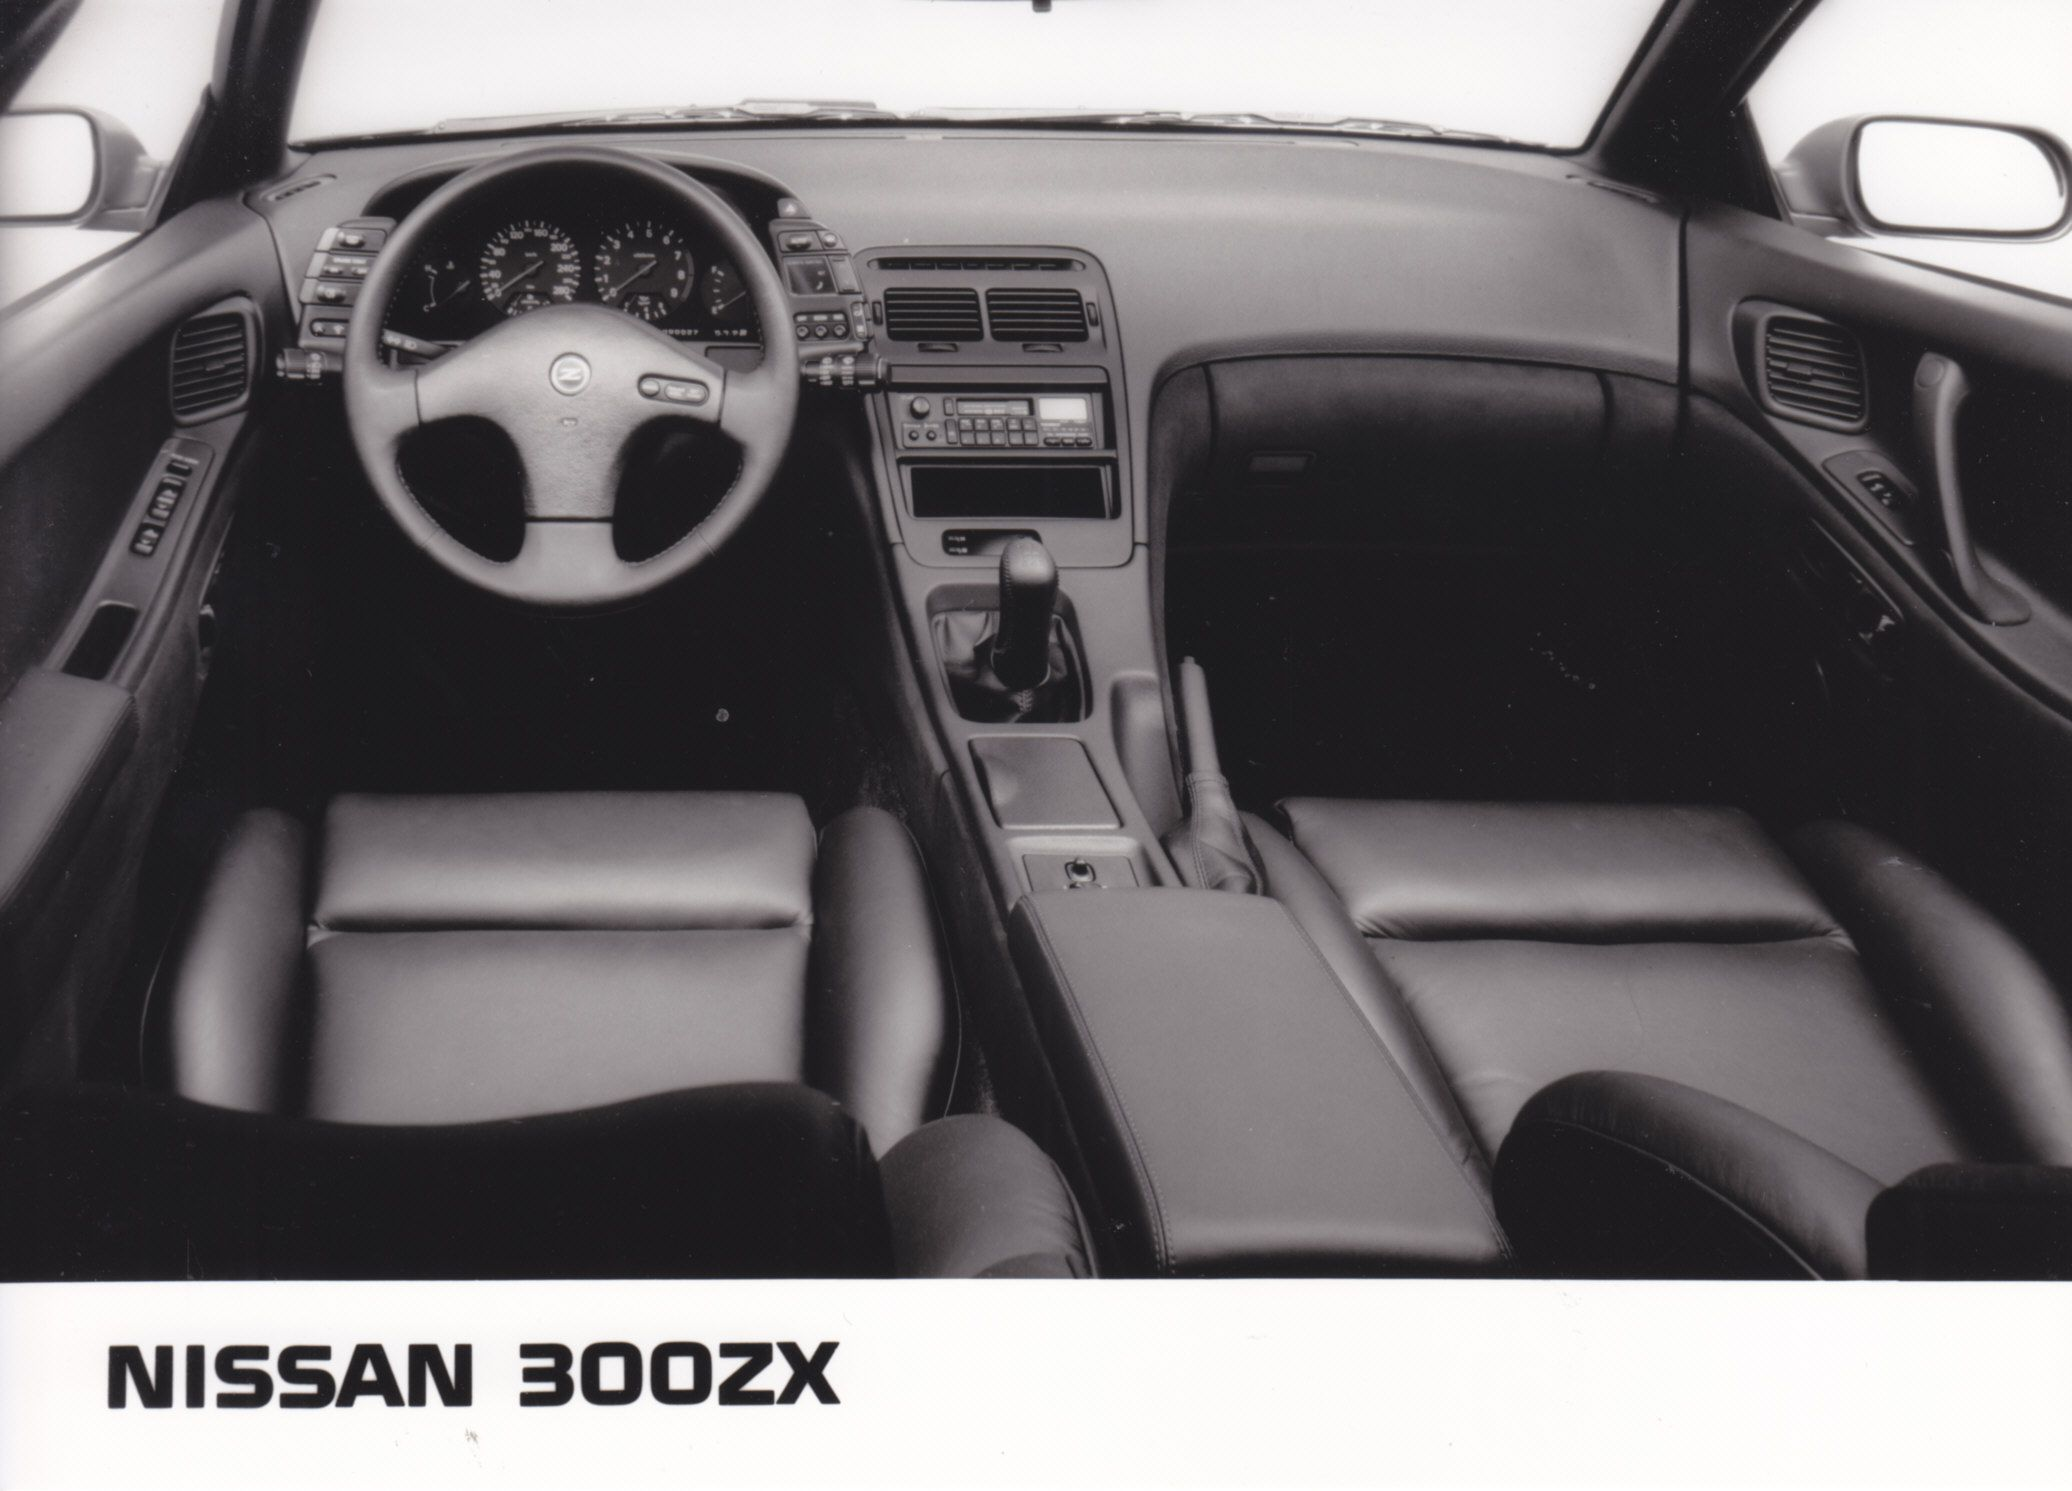 Nissan 300 Zx Dashboard 1991 Nissan 300zx Nissan Nissan Z